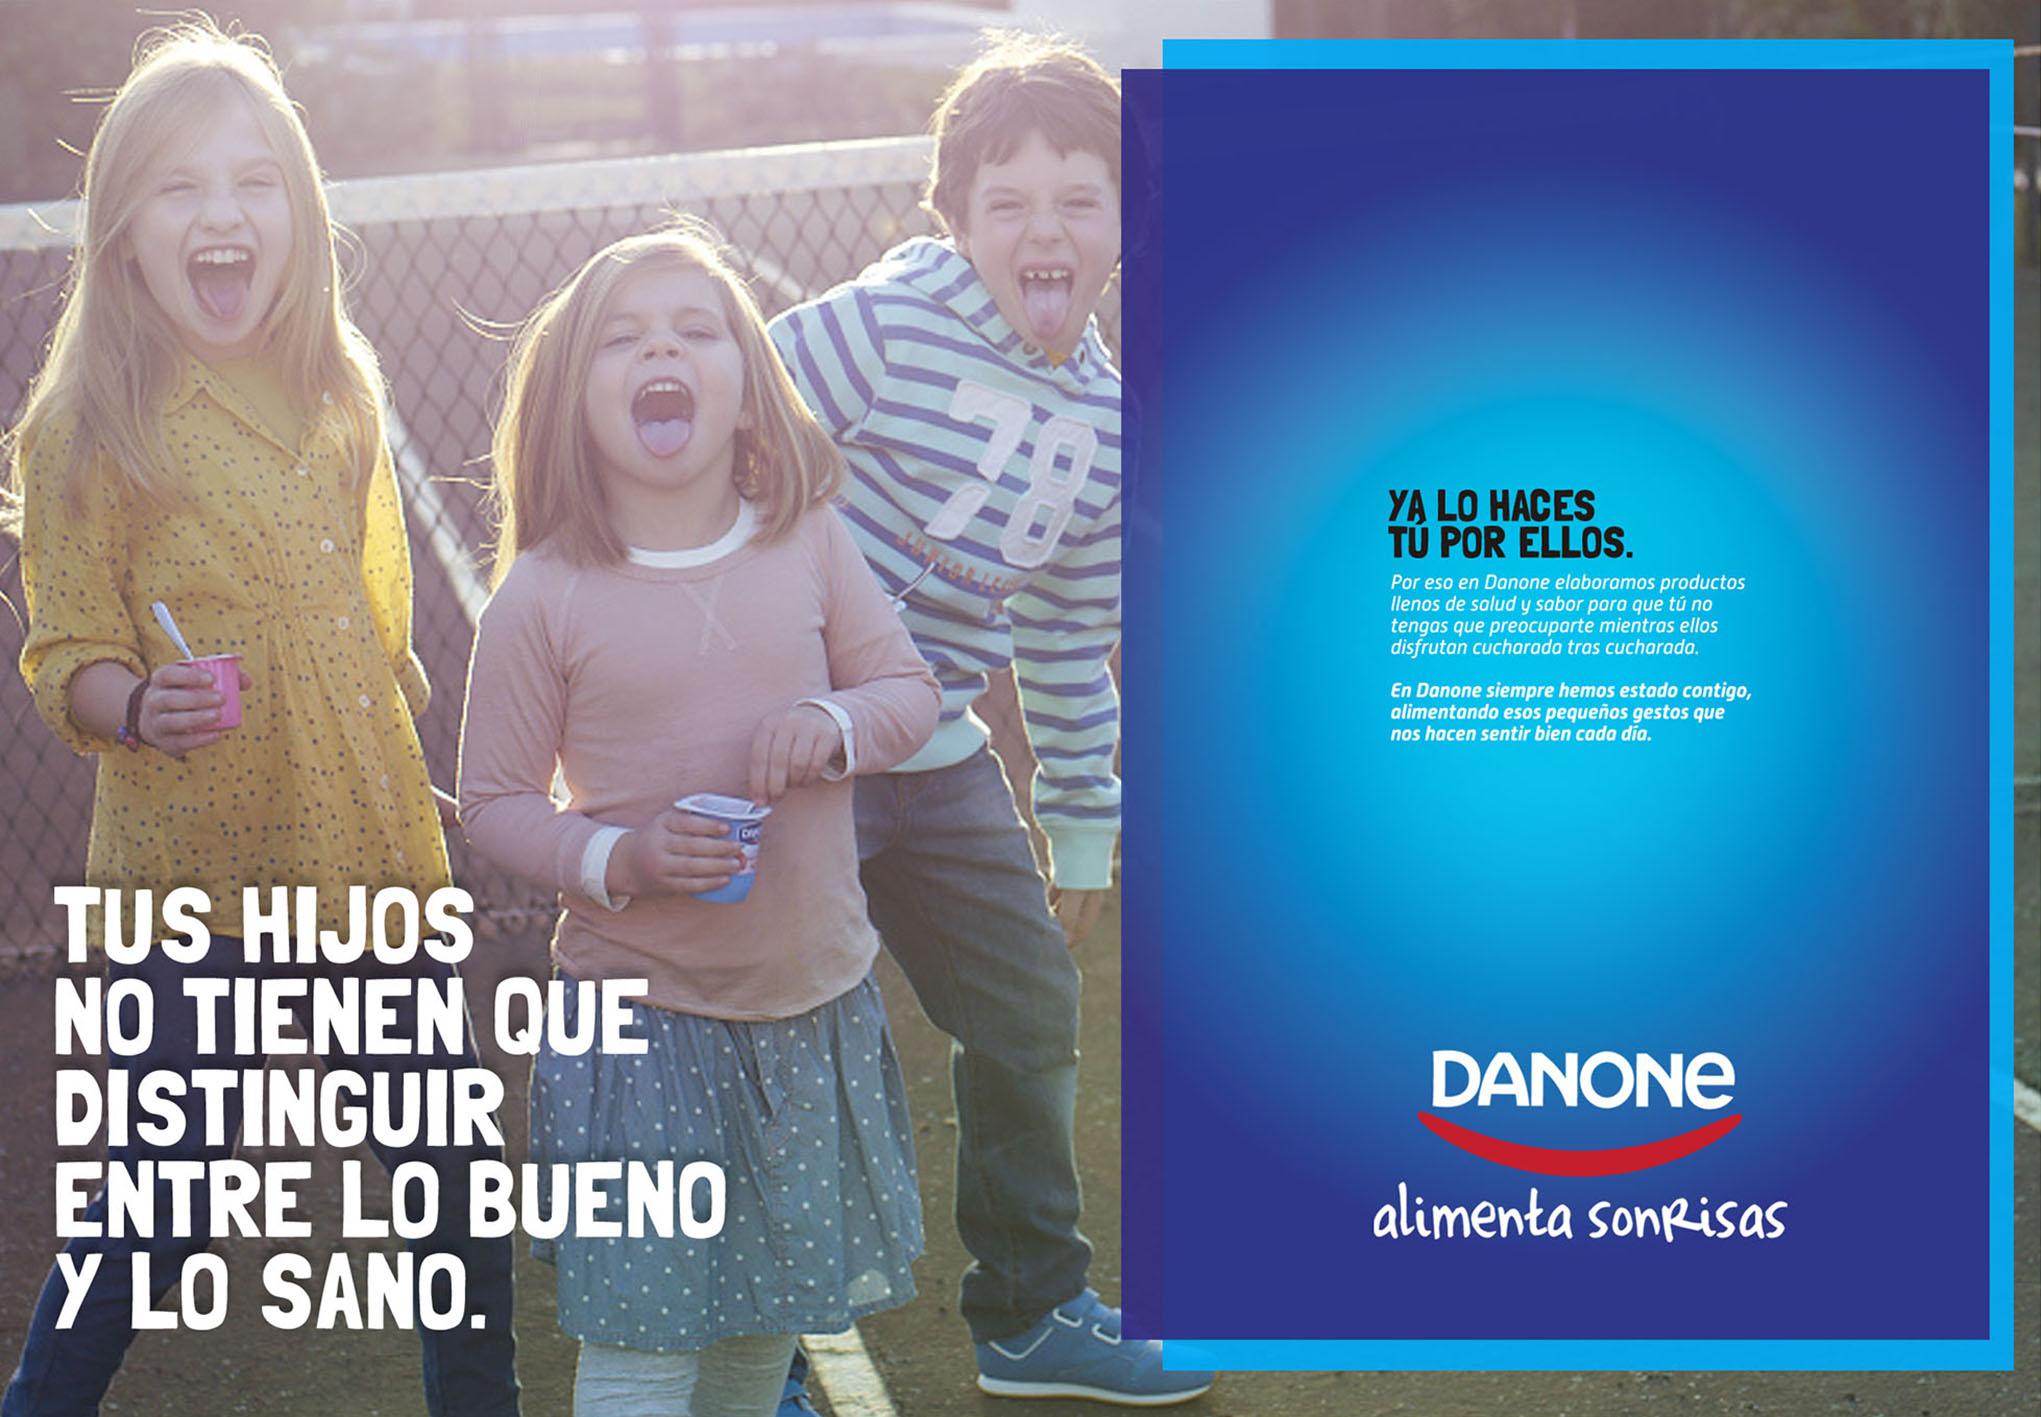 Danone 02.jpg